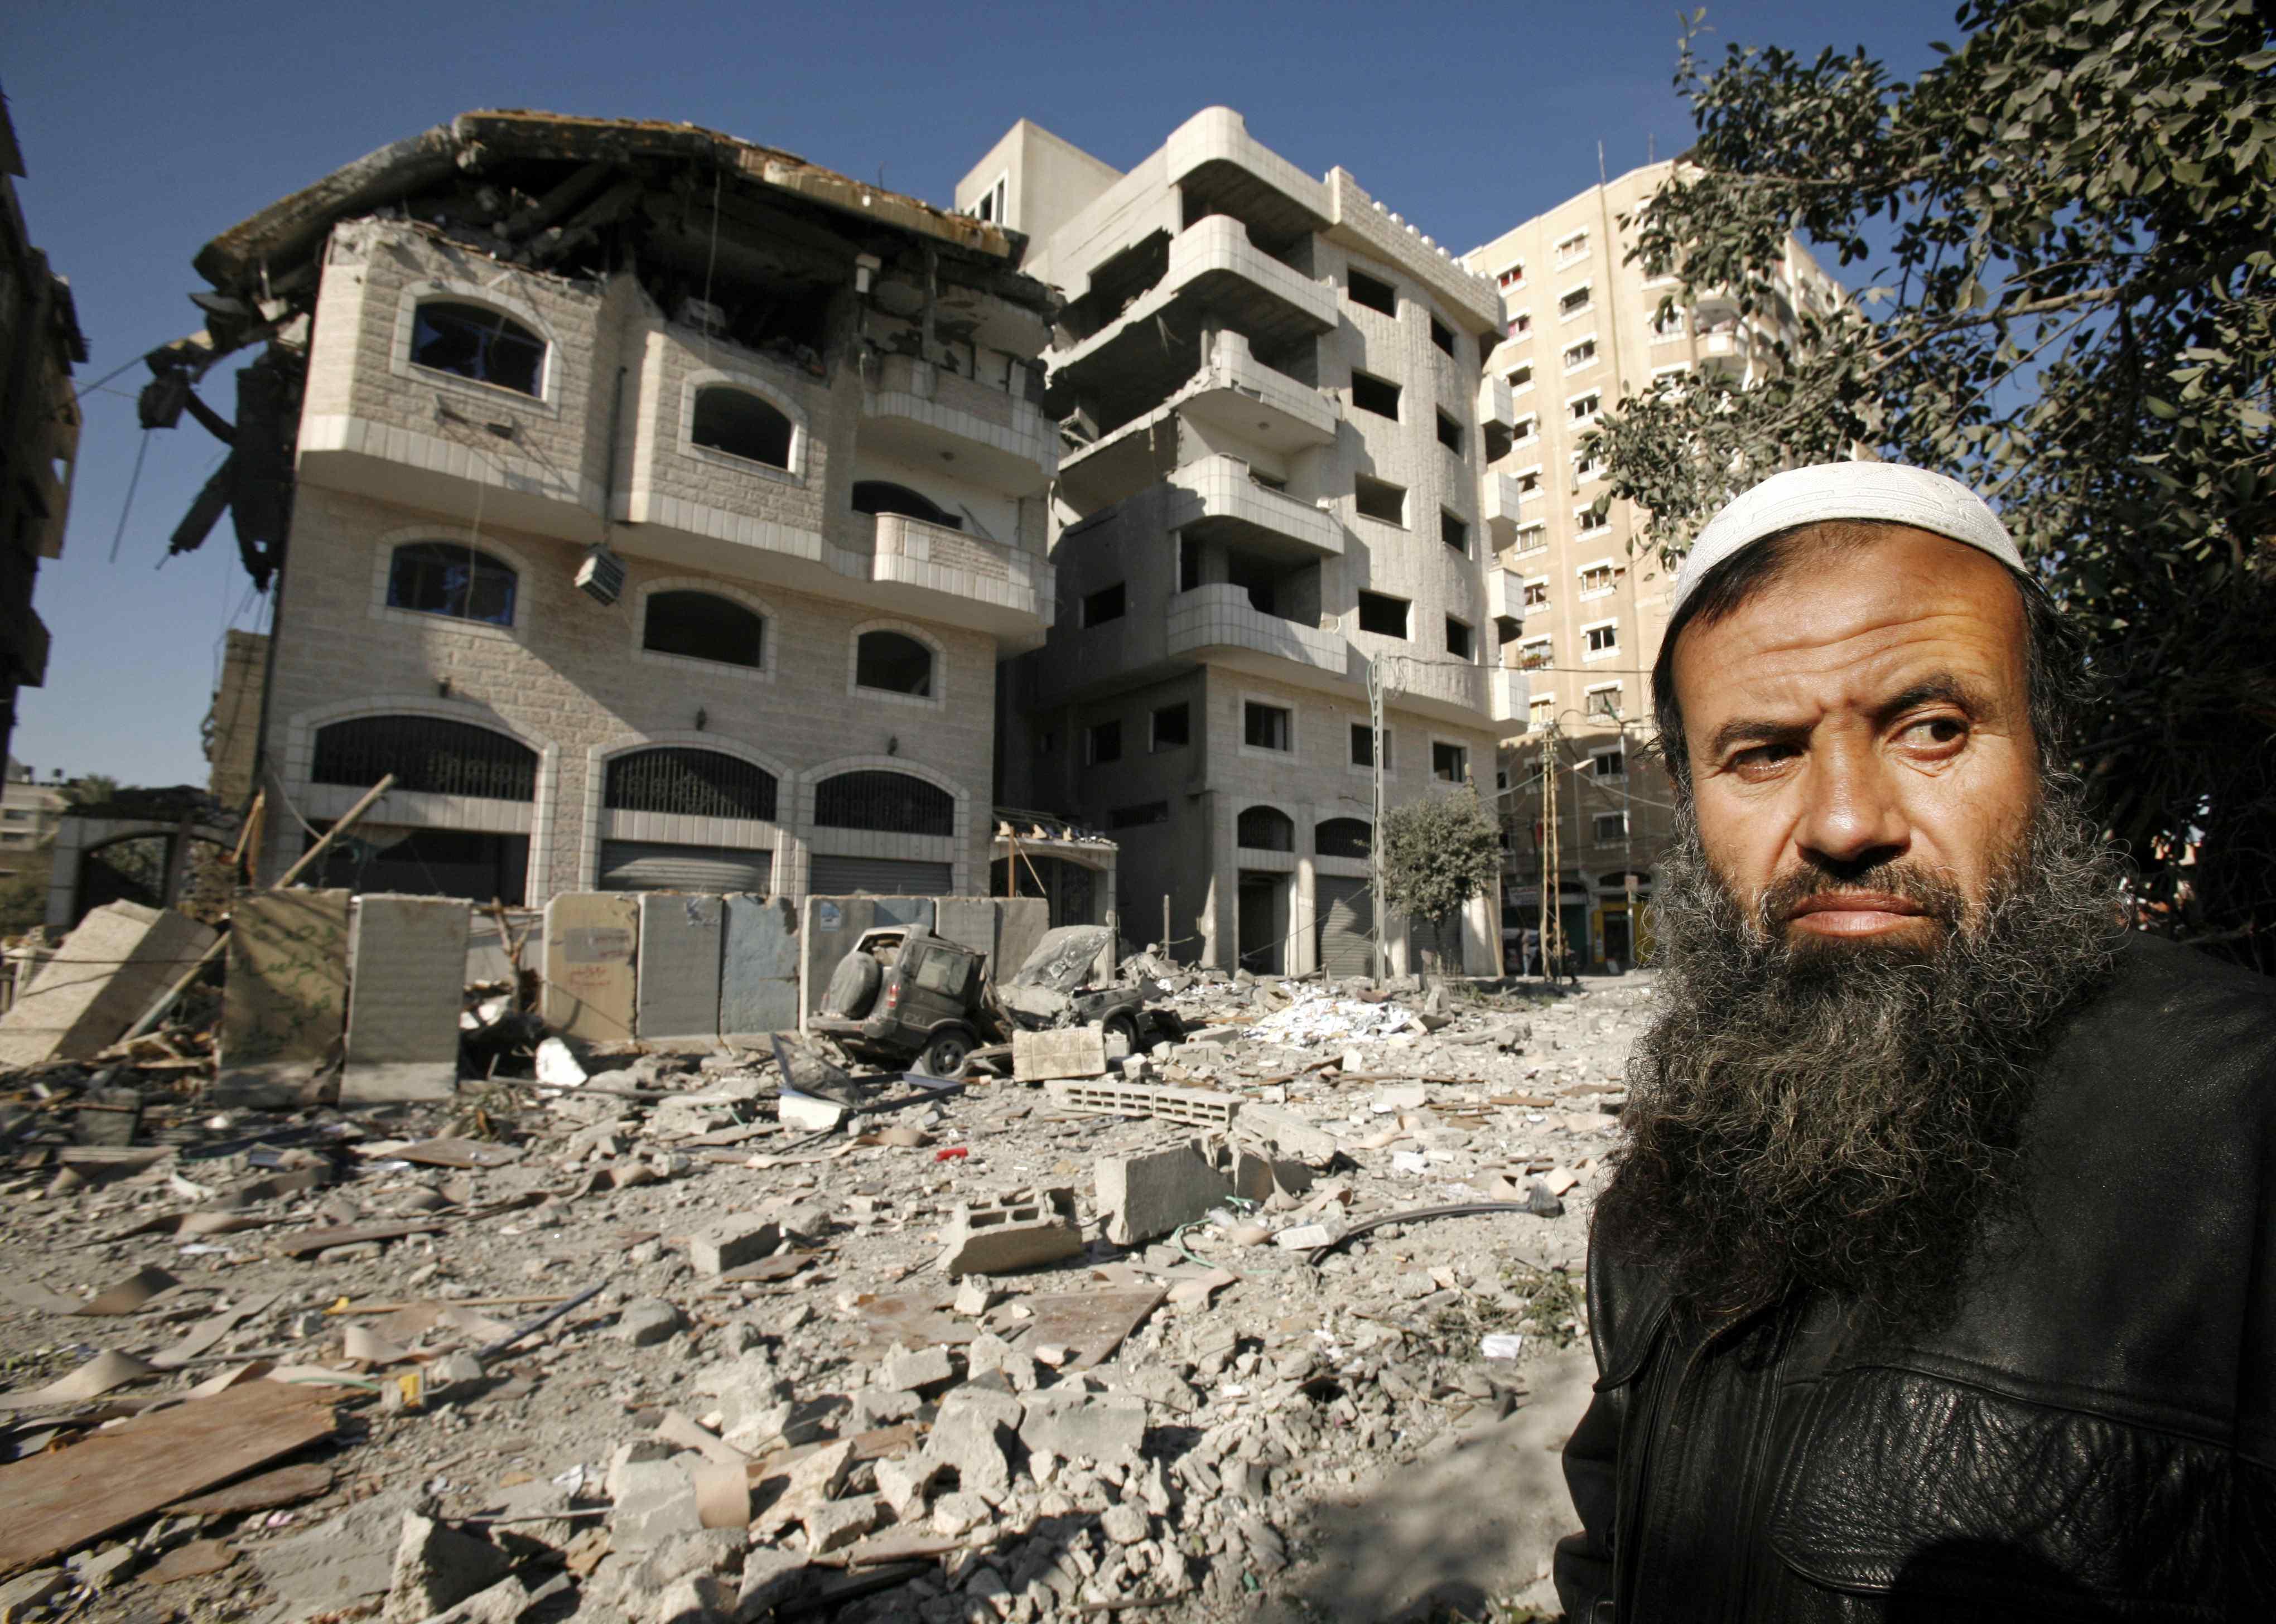 A Palestinian man walks past a destroyed Hamas-run Interior Ministry in Gaza City, Gaza Strip yesterday.